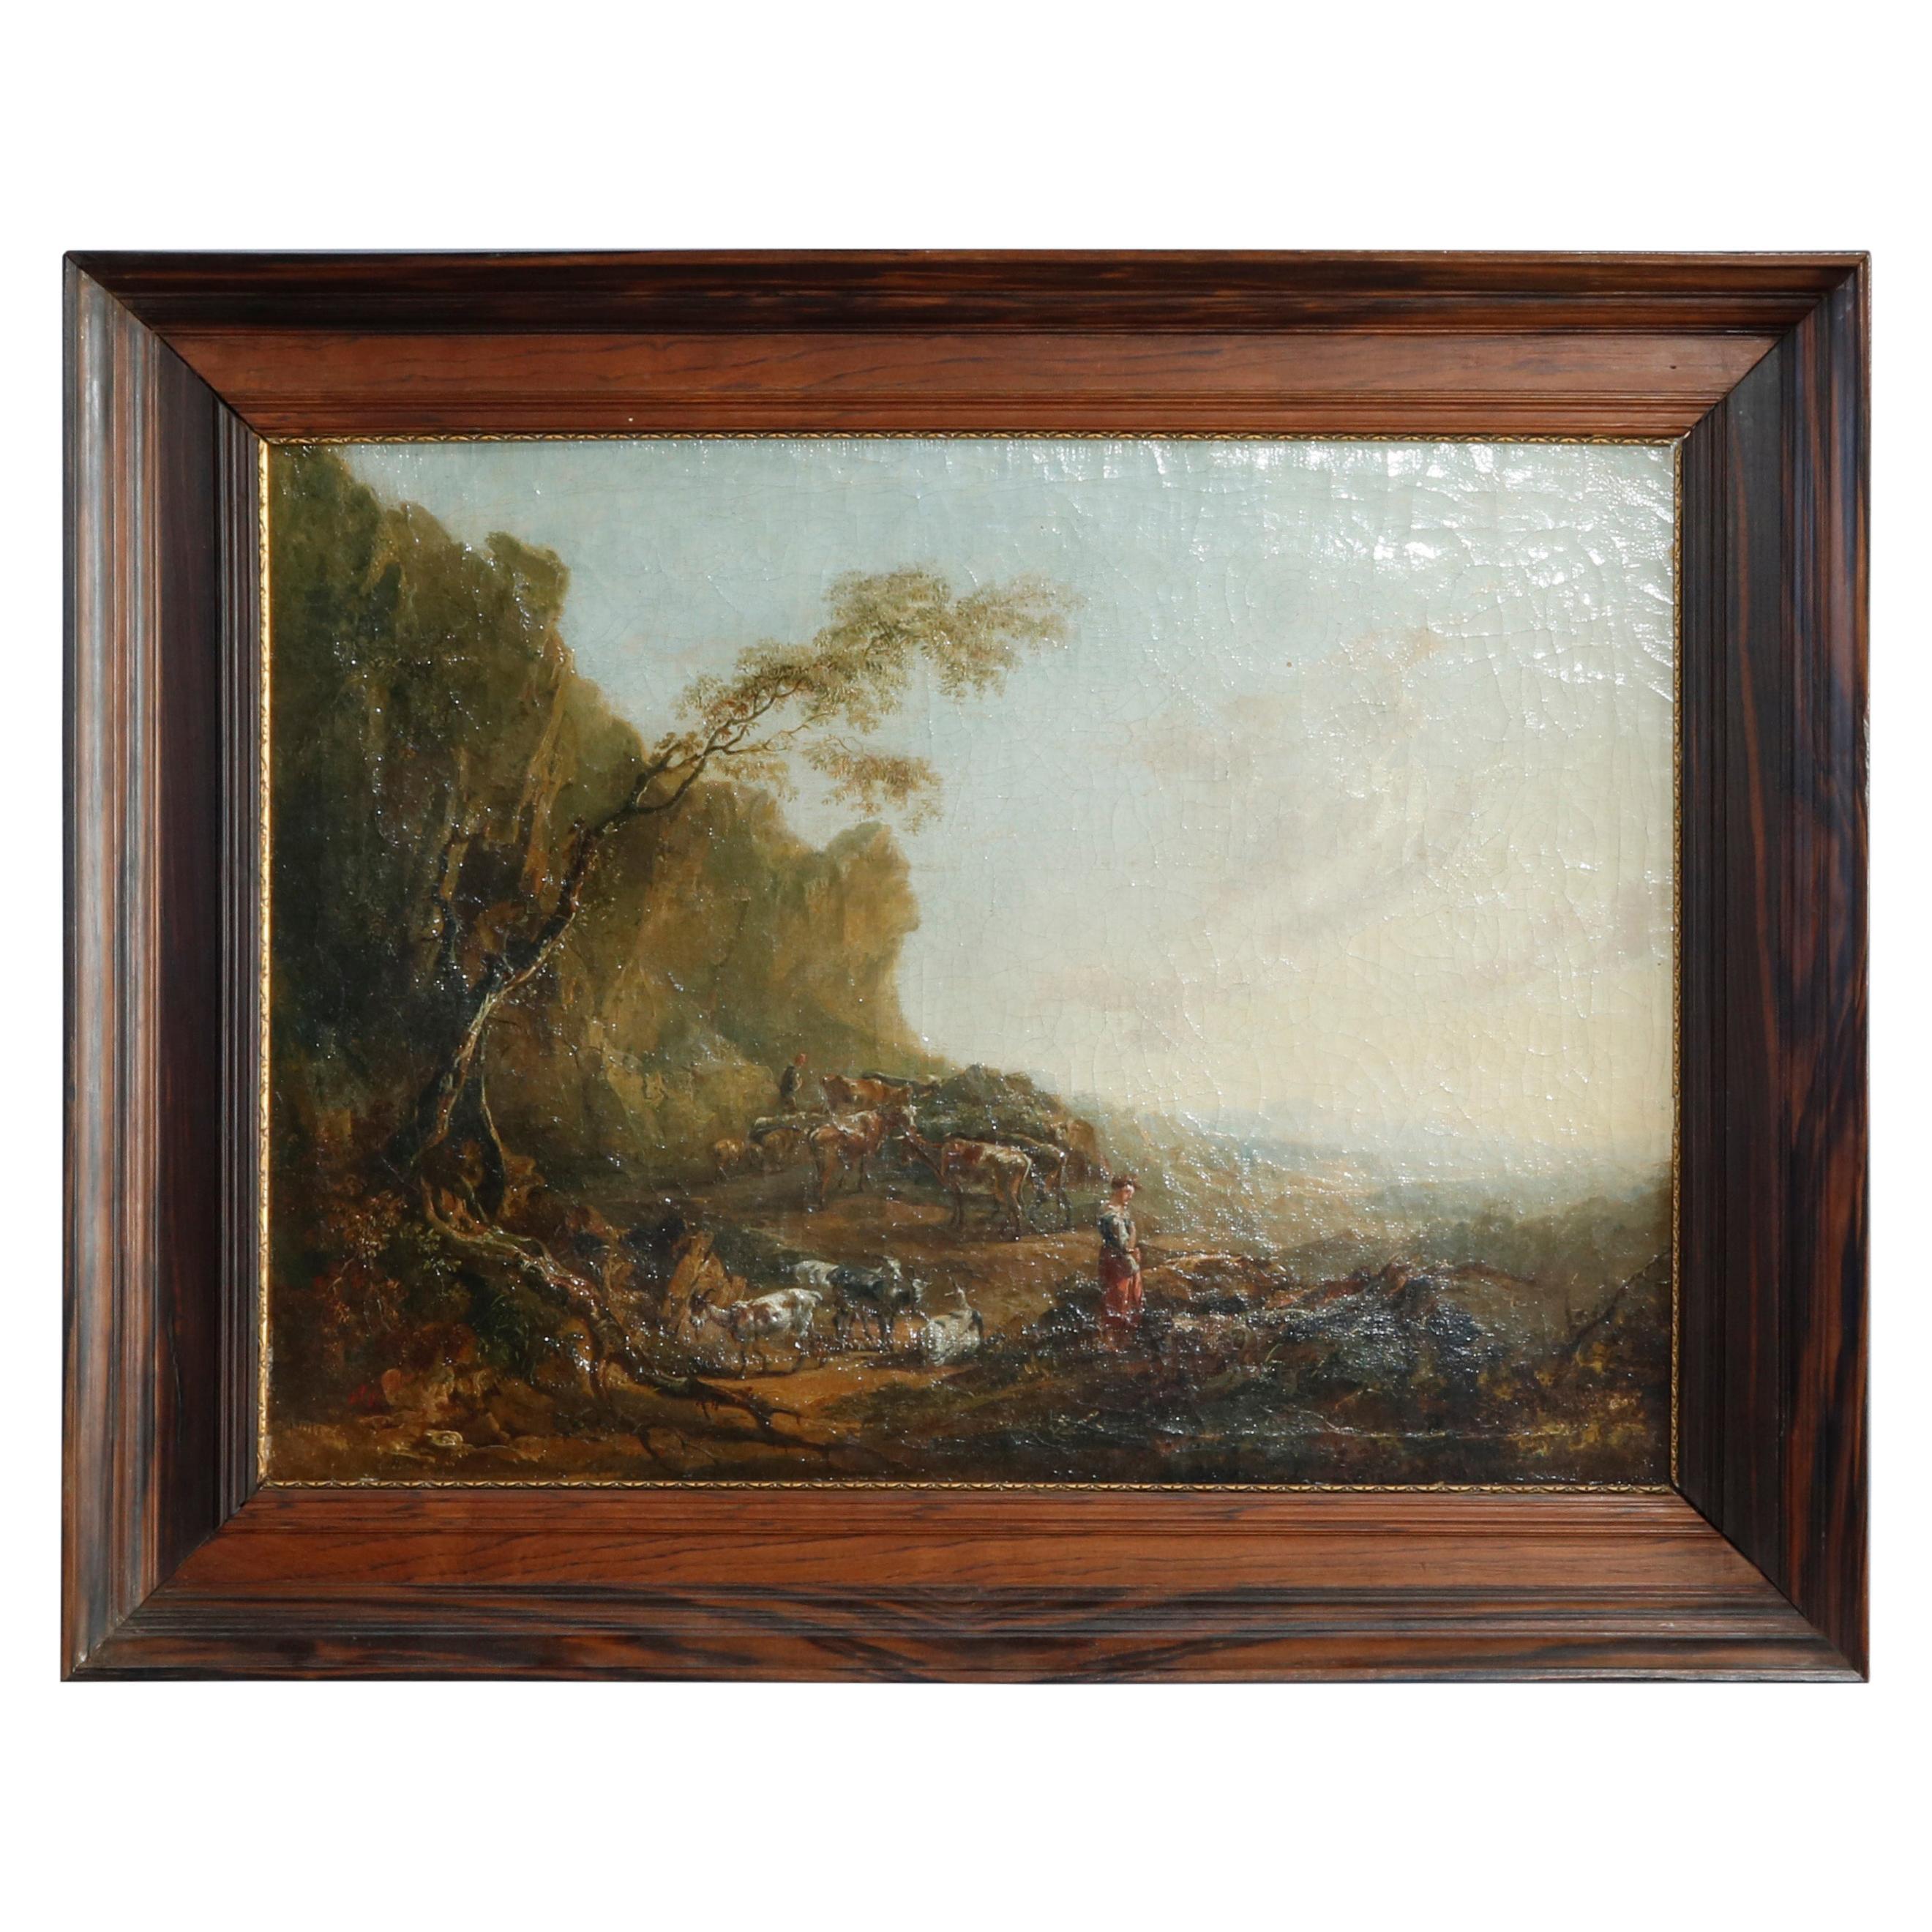 Antique European Oil Painting, Landscape with Figures & Livestock, Mid-19th C